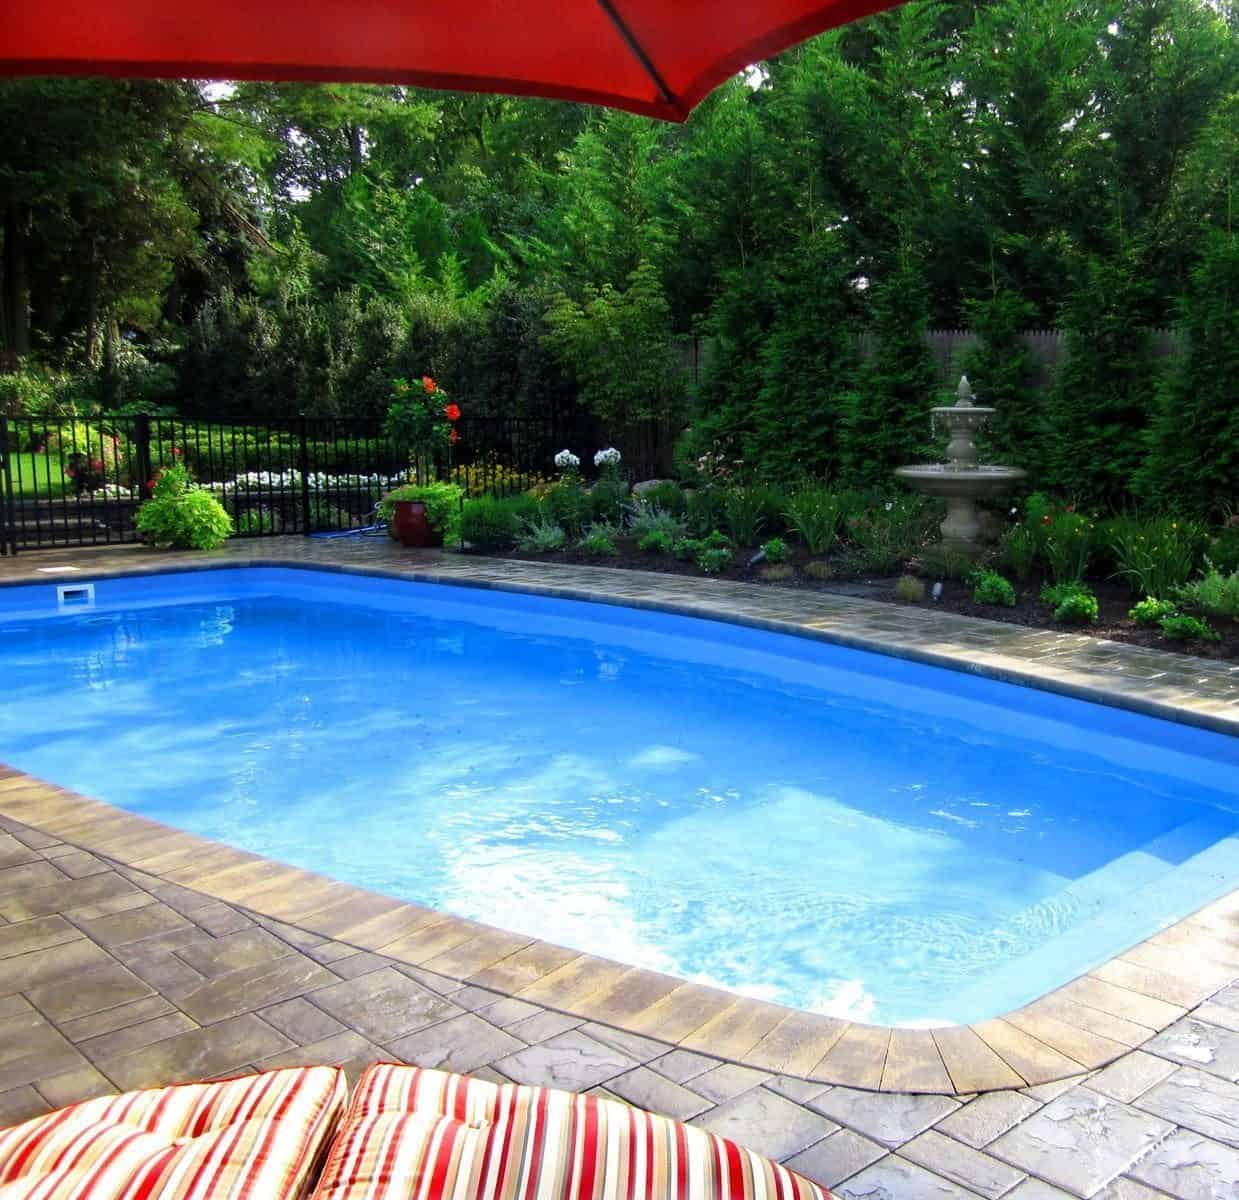 16' x 32' Fiberglass Pool with full length steps - Glen Cove, Long Island NY